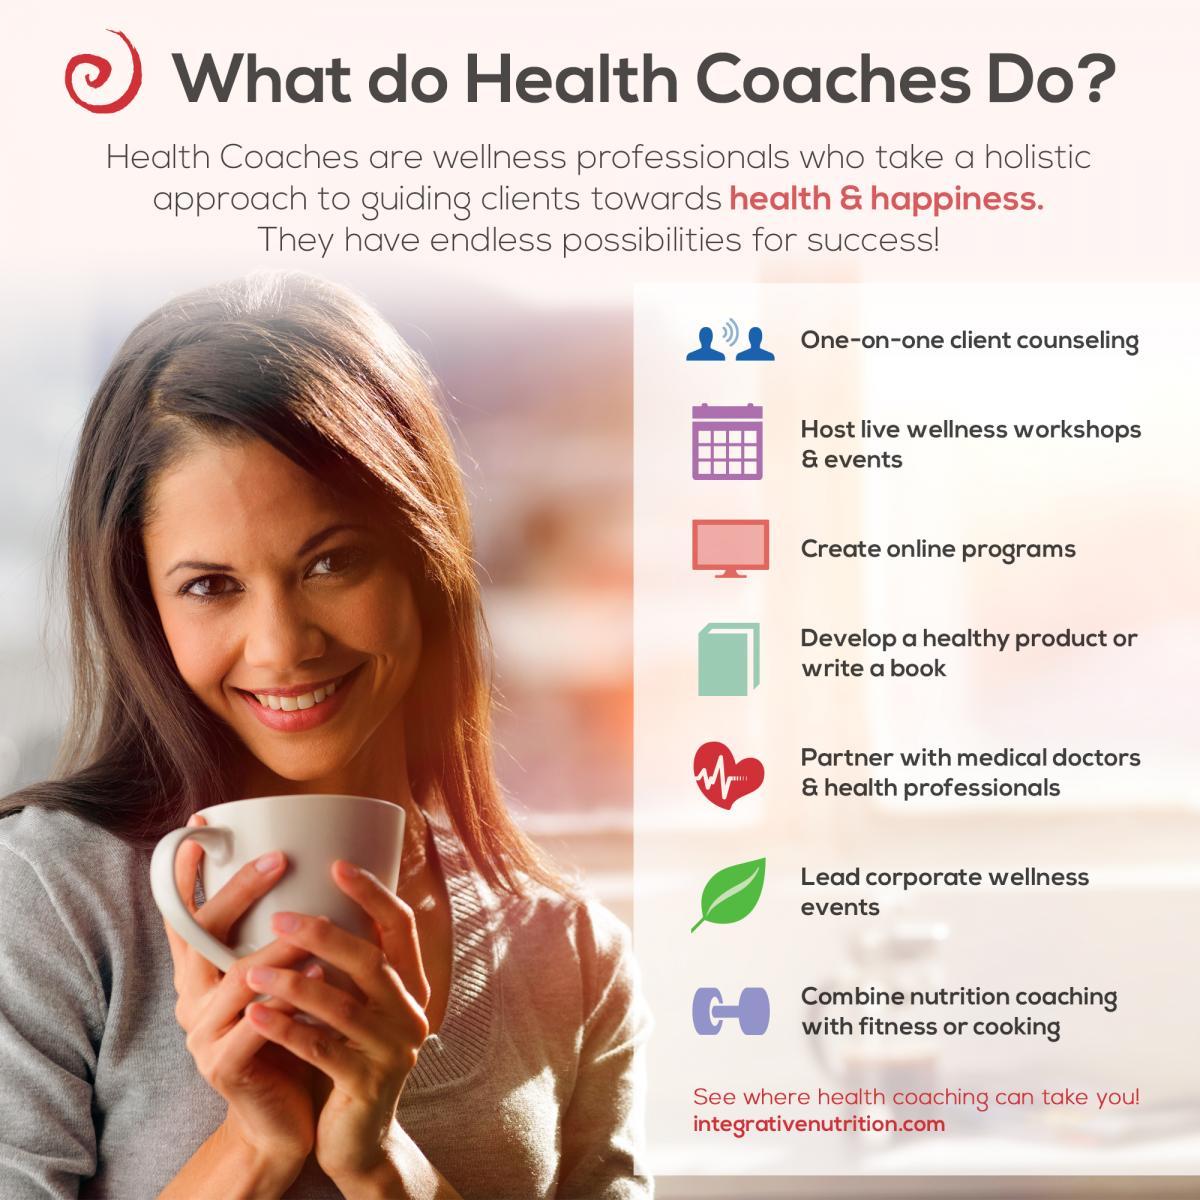 What do health coaches do?